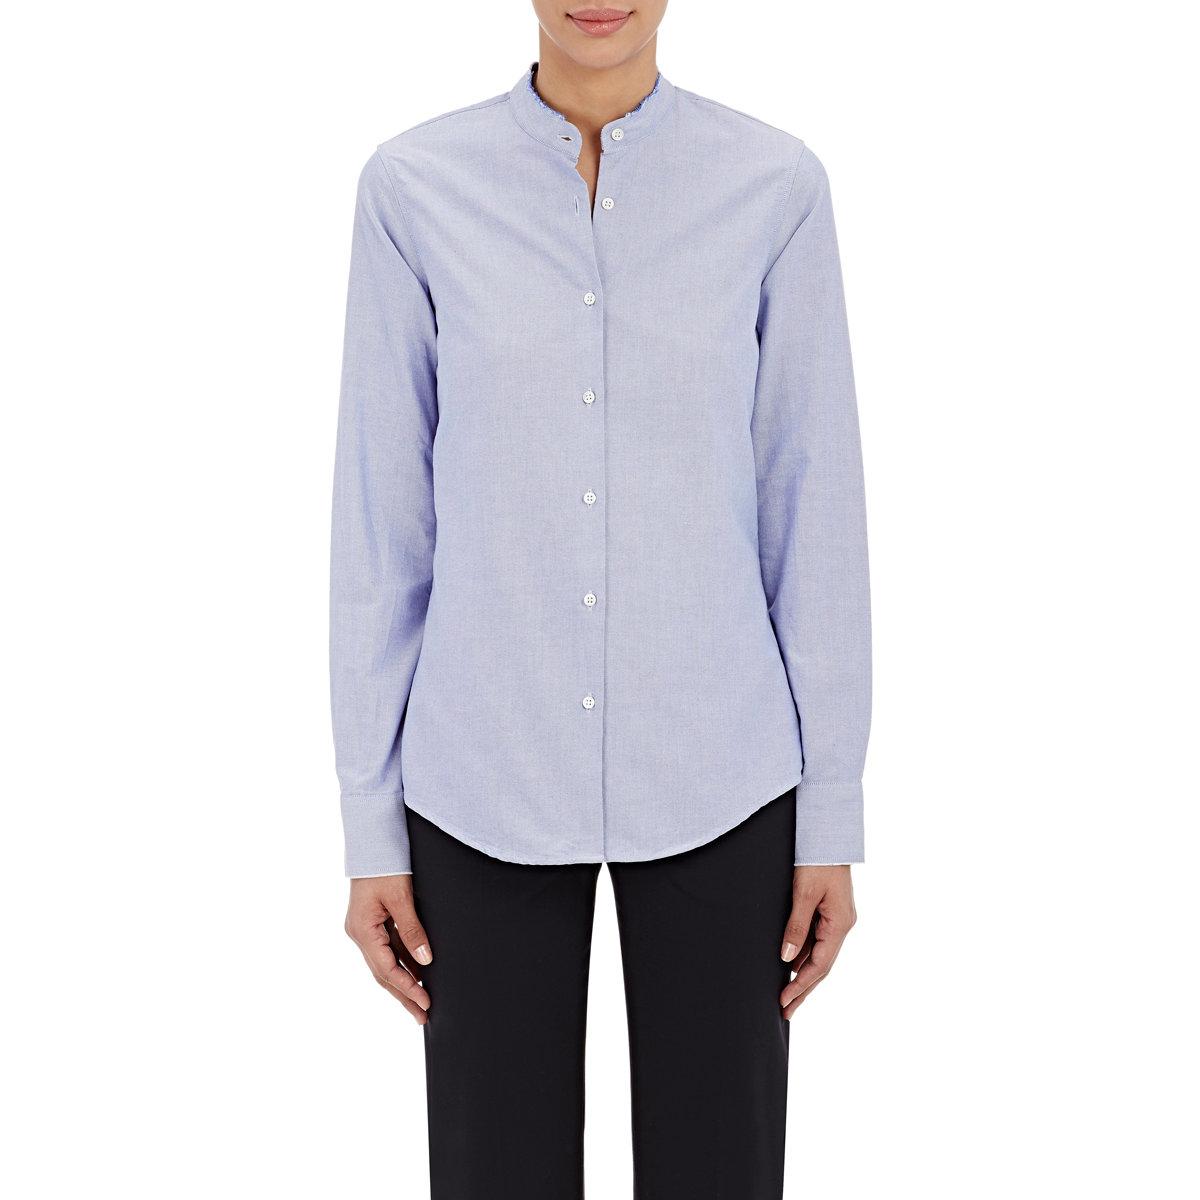 barneys new york oxford cloth shirt in blue light blue